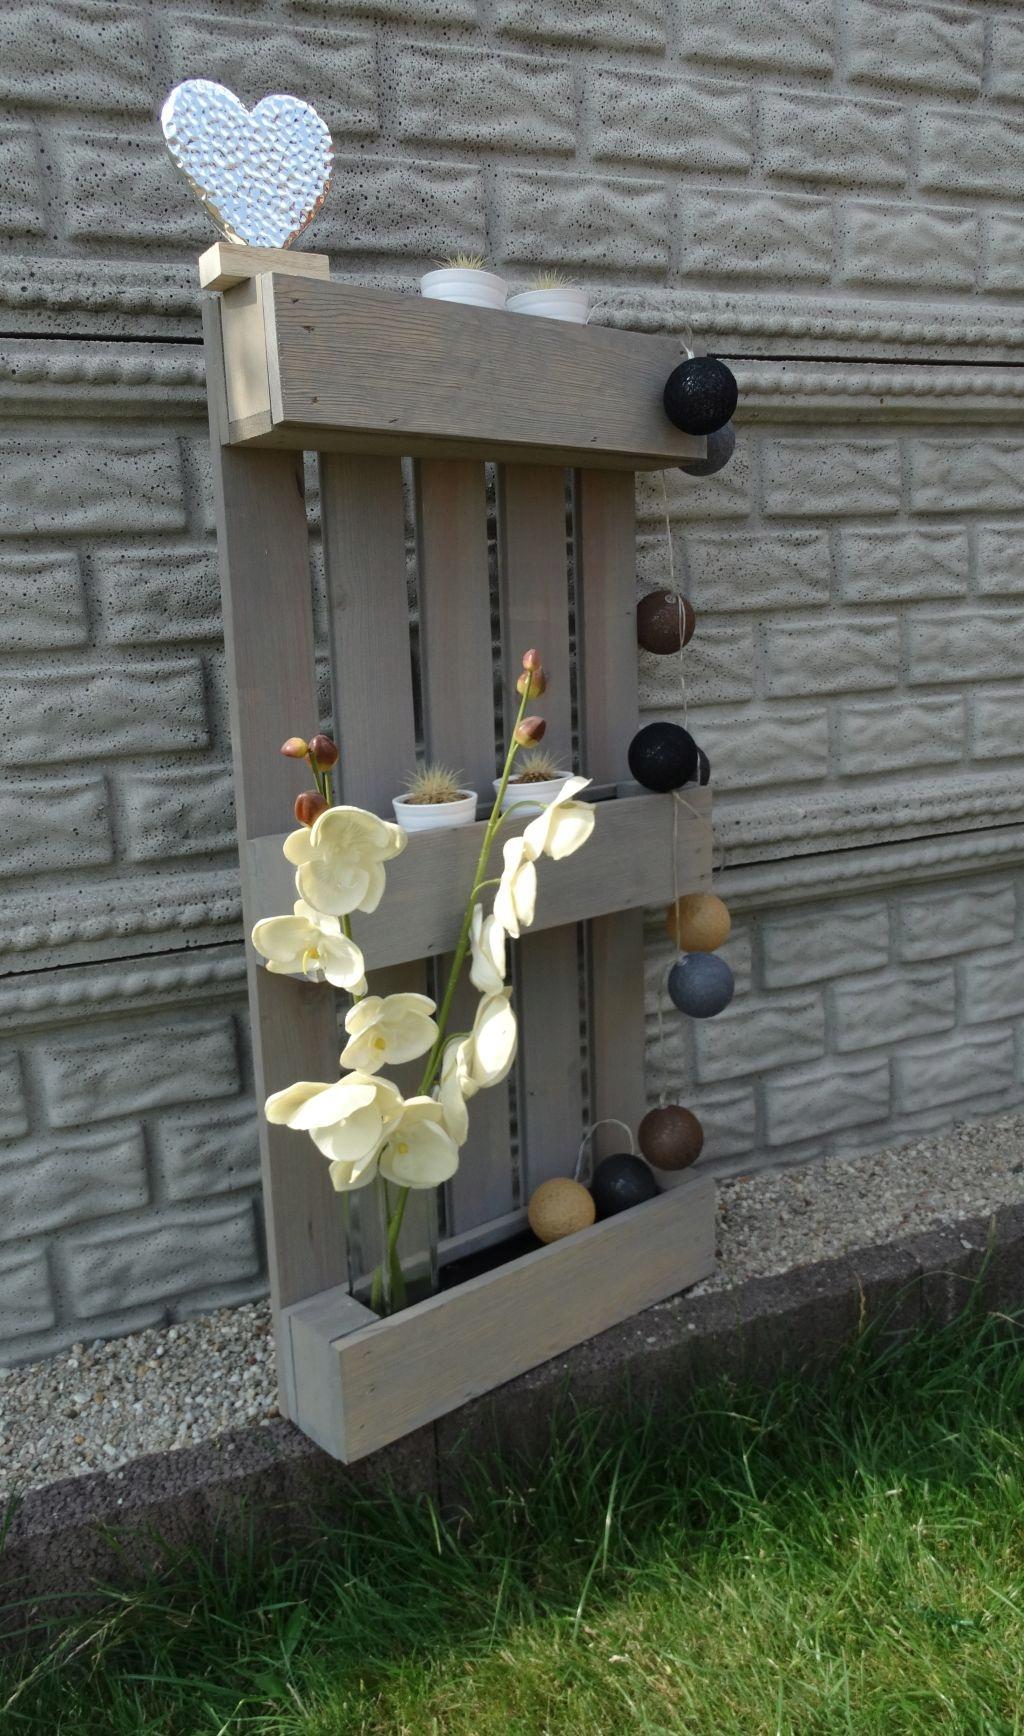 Kwietnik Ogród Balkon Paleta Regał Stojak Prezent